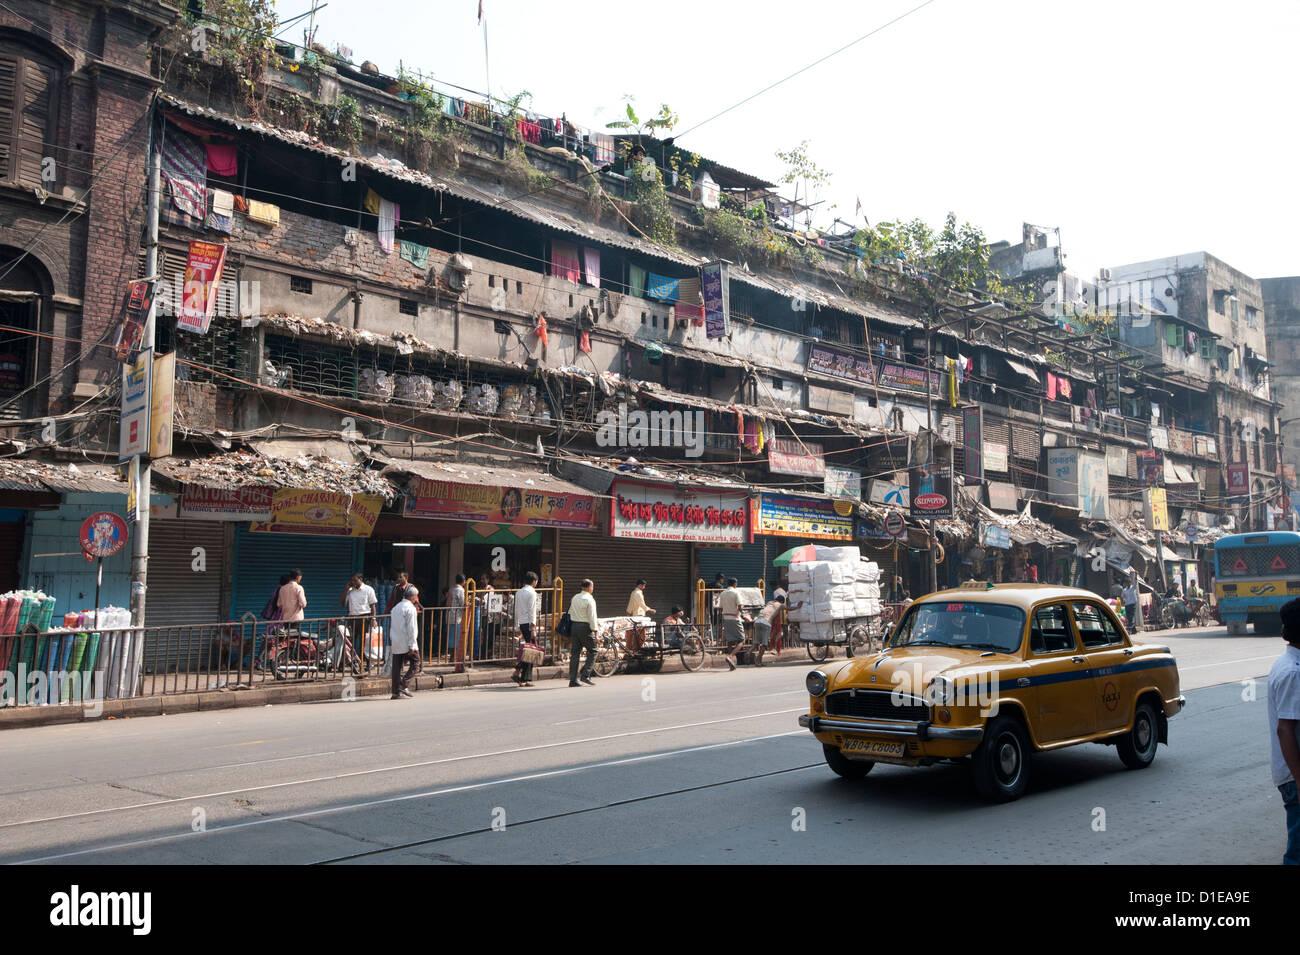 Yellow Kolkata taxi passing Kolkata slums in the early morning, Kolkata, West Bengal, India, Asia - Stock Image